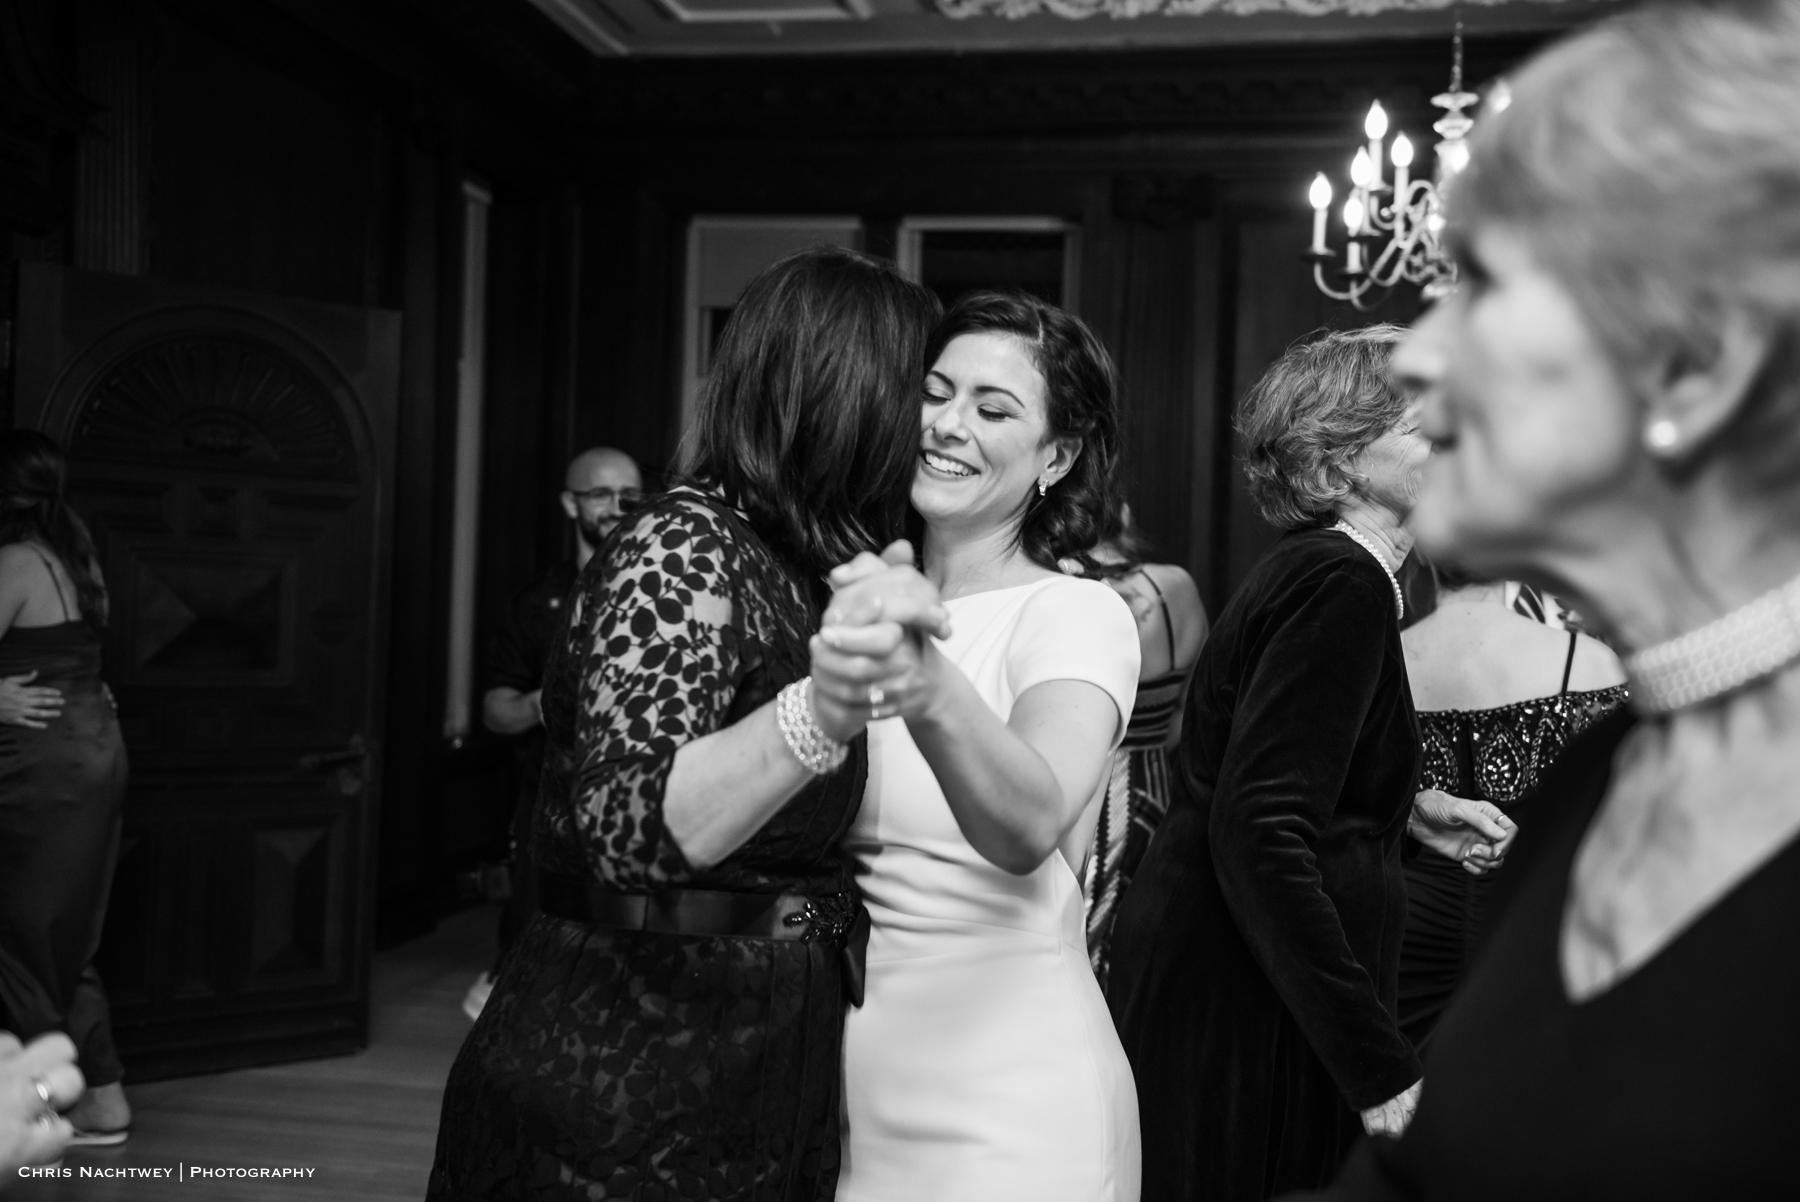 winter-branford-house-wedding-photos-groton-ct-chris-nachtwey-photography-2019-47.jpg